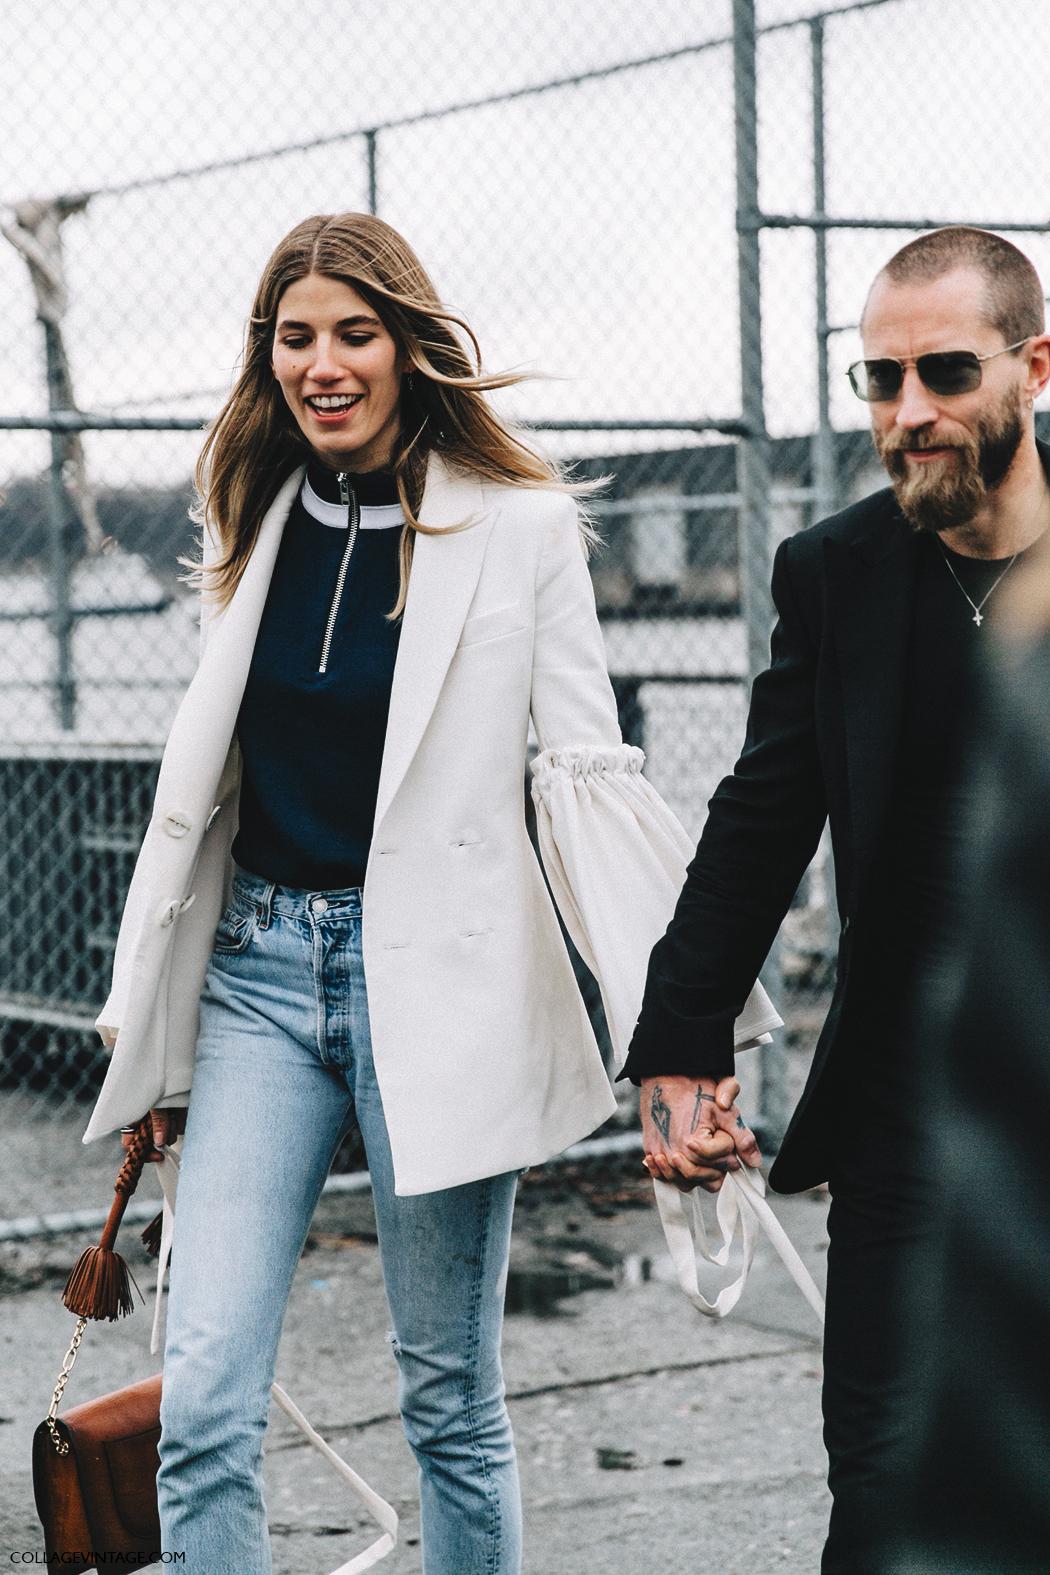 NYFW-New_York_Fashion_Week-Fall_Winter-17-Street_Style-Justin_Oshea-Veronika_Heilbrunner-